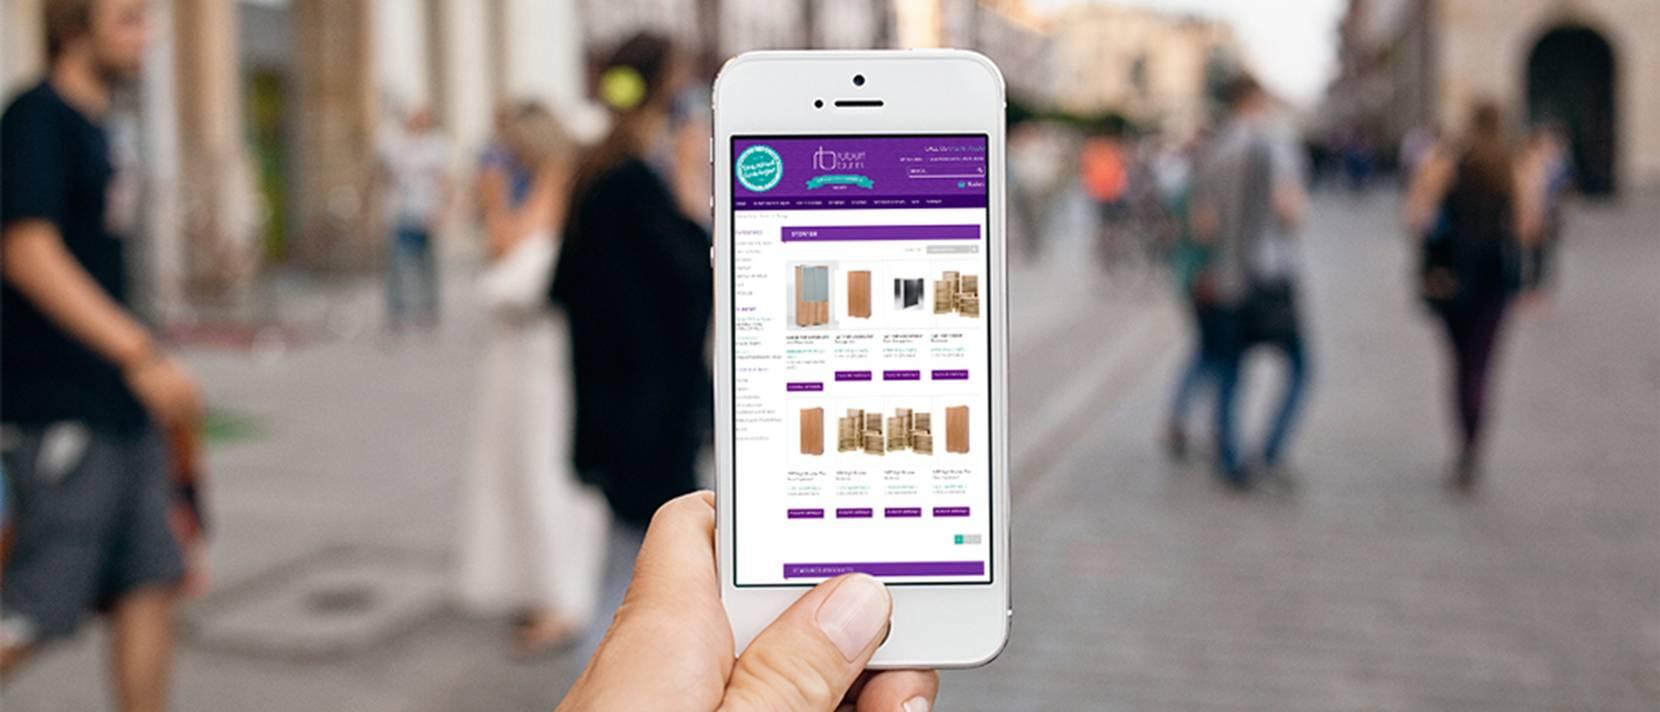 robert bunn ecommerce on mobile phone in street small